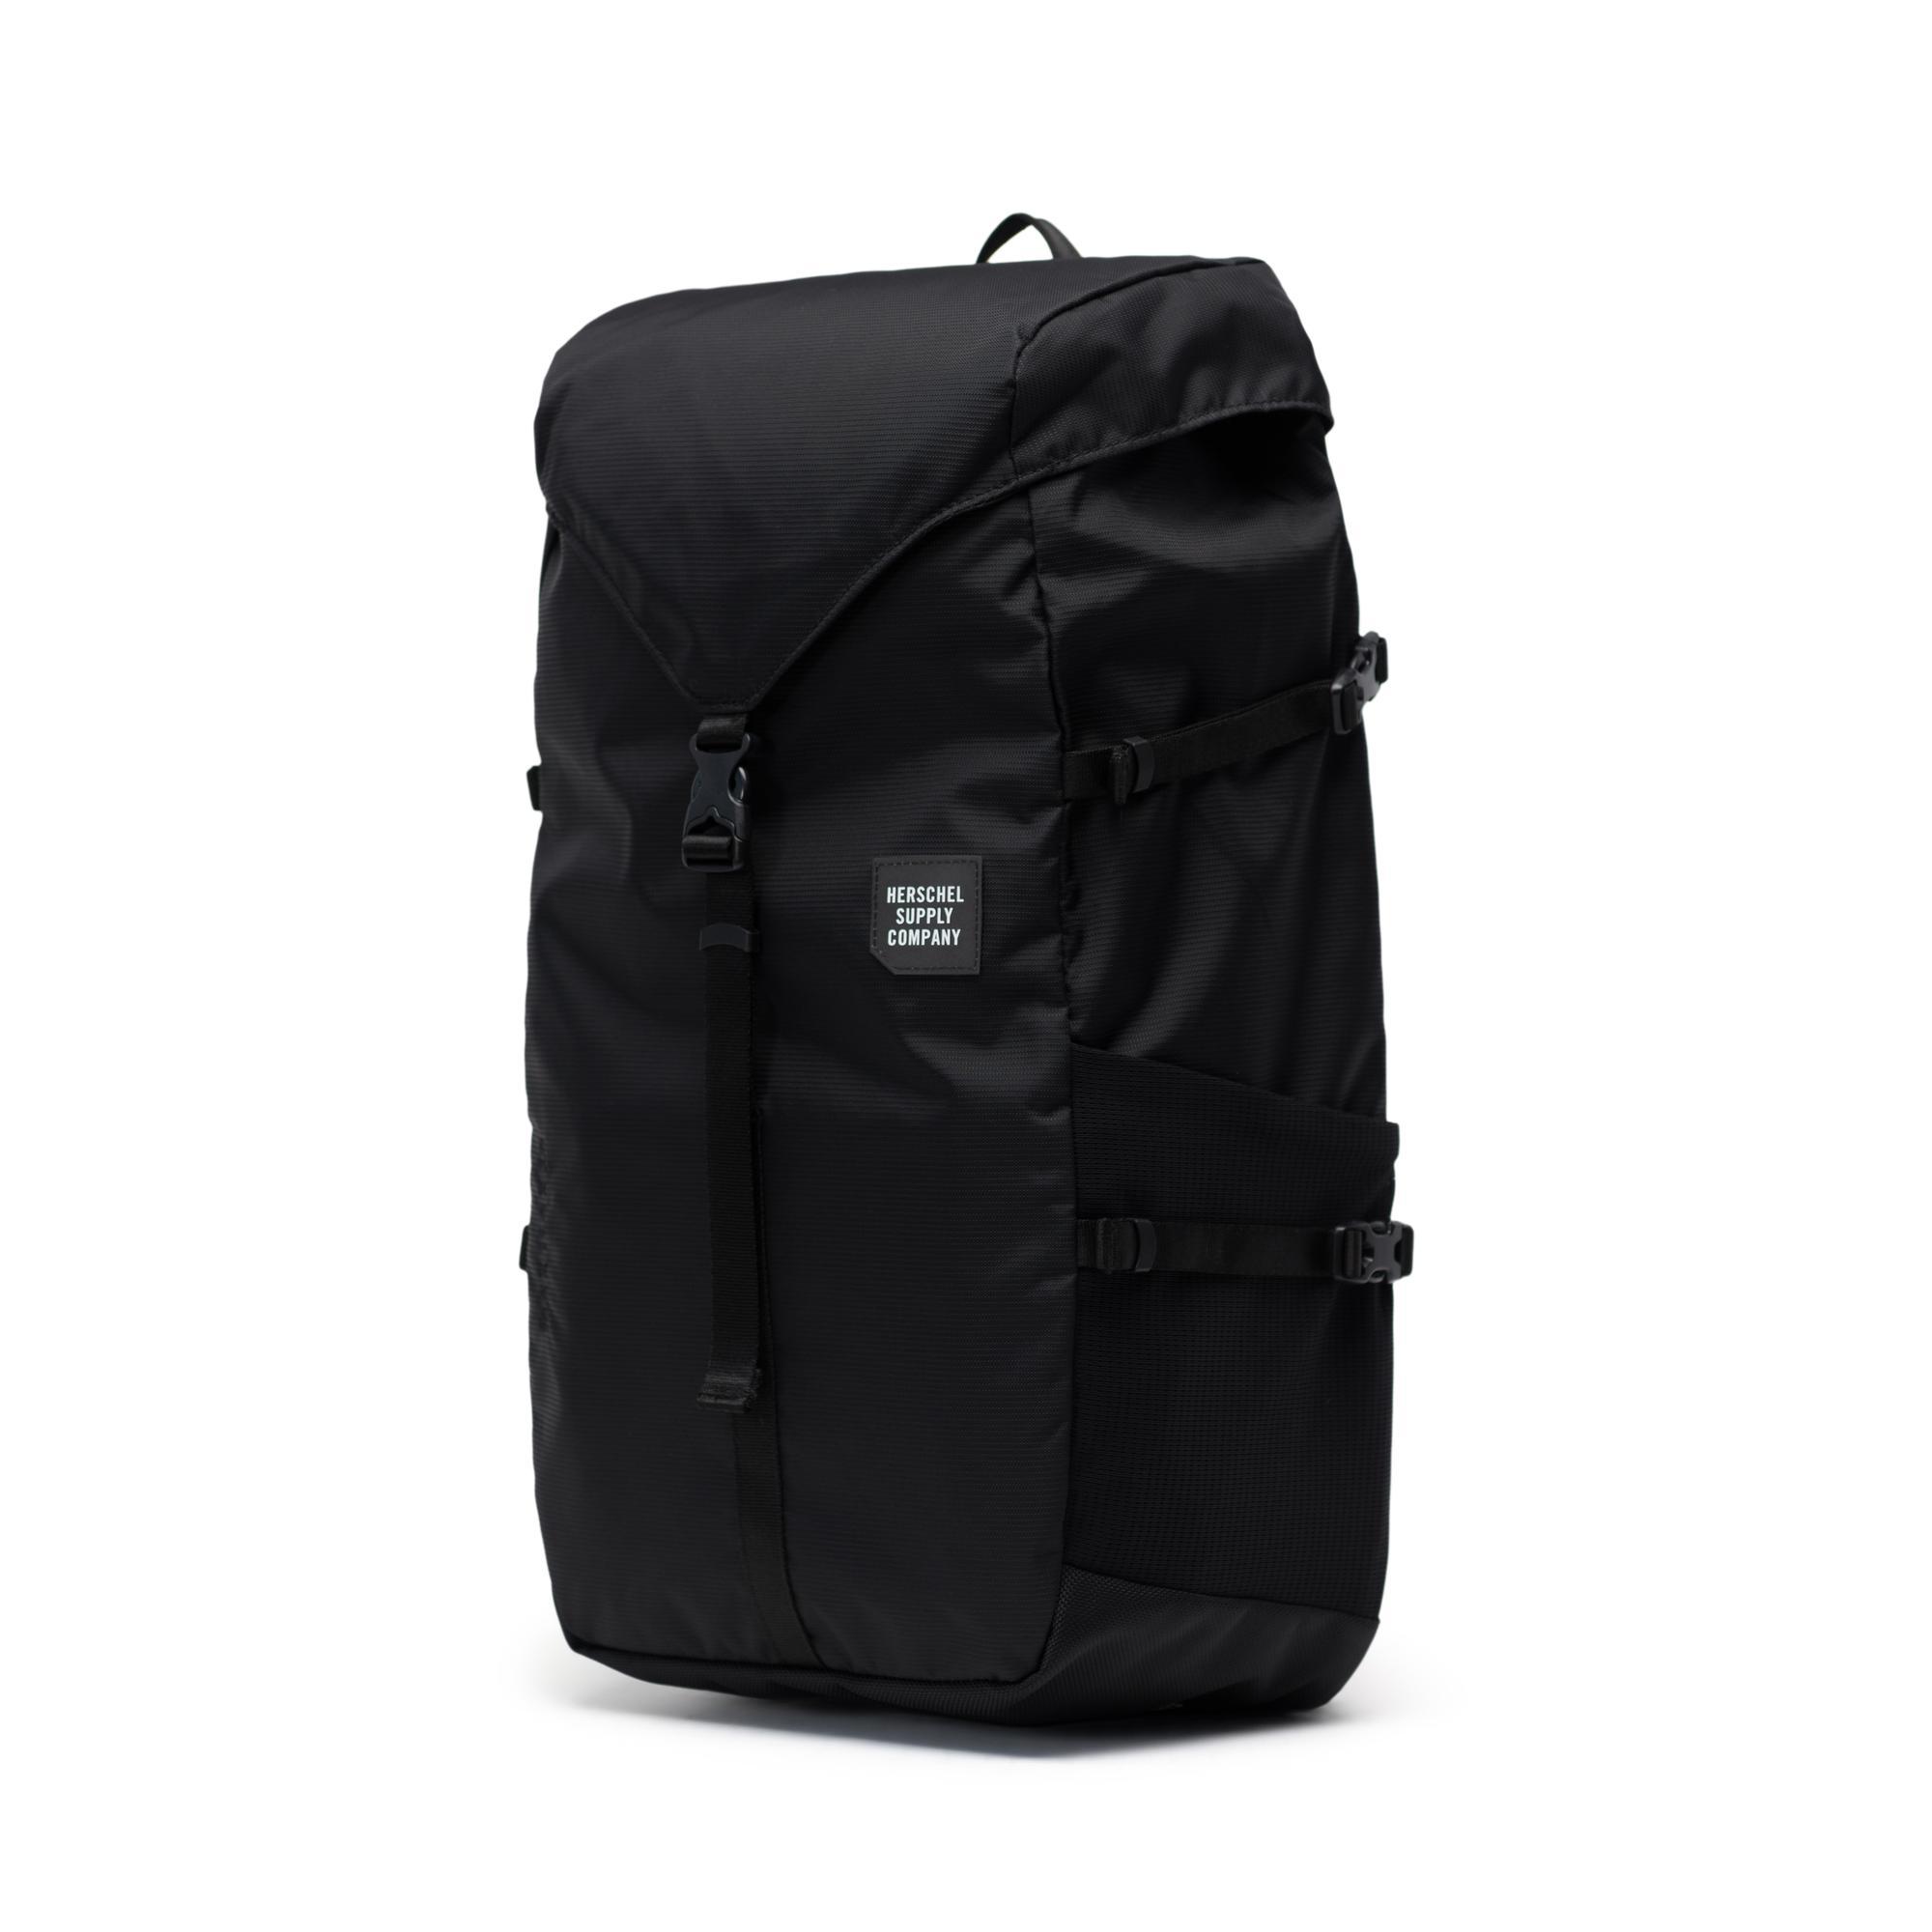 426a513dfa3 Barlow Backpack Large